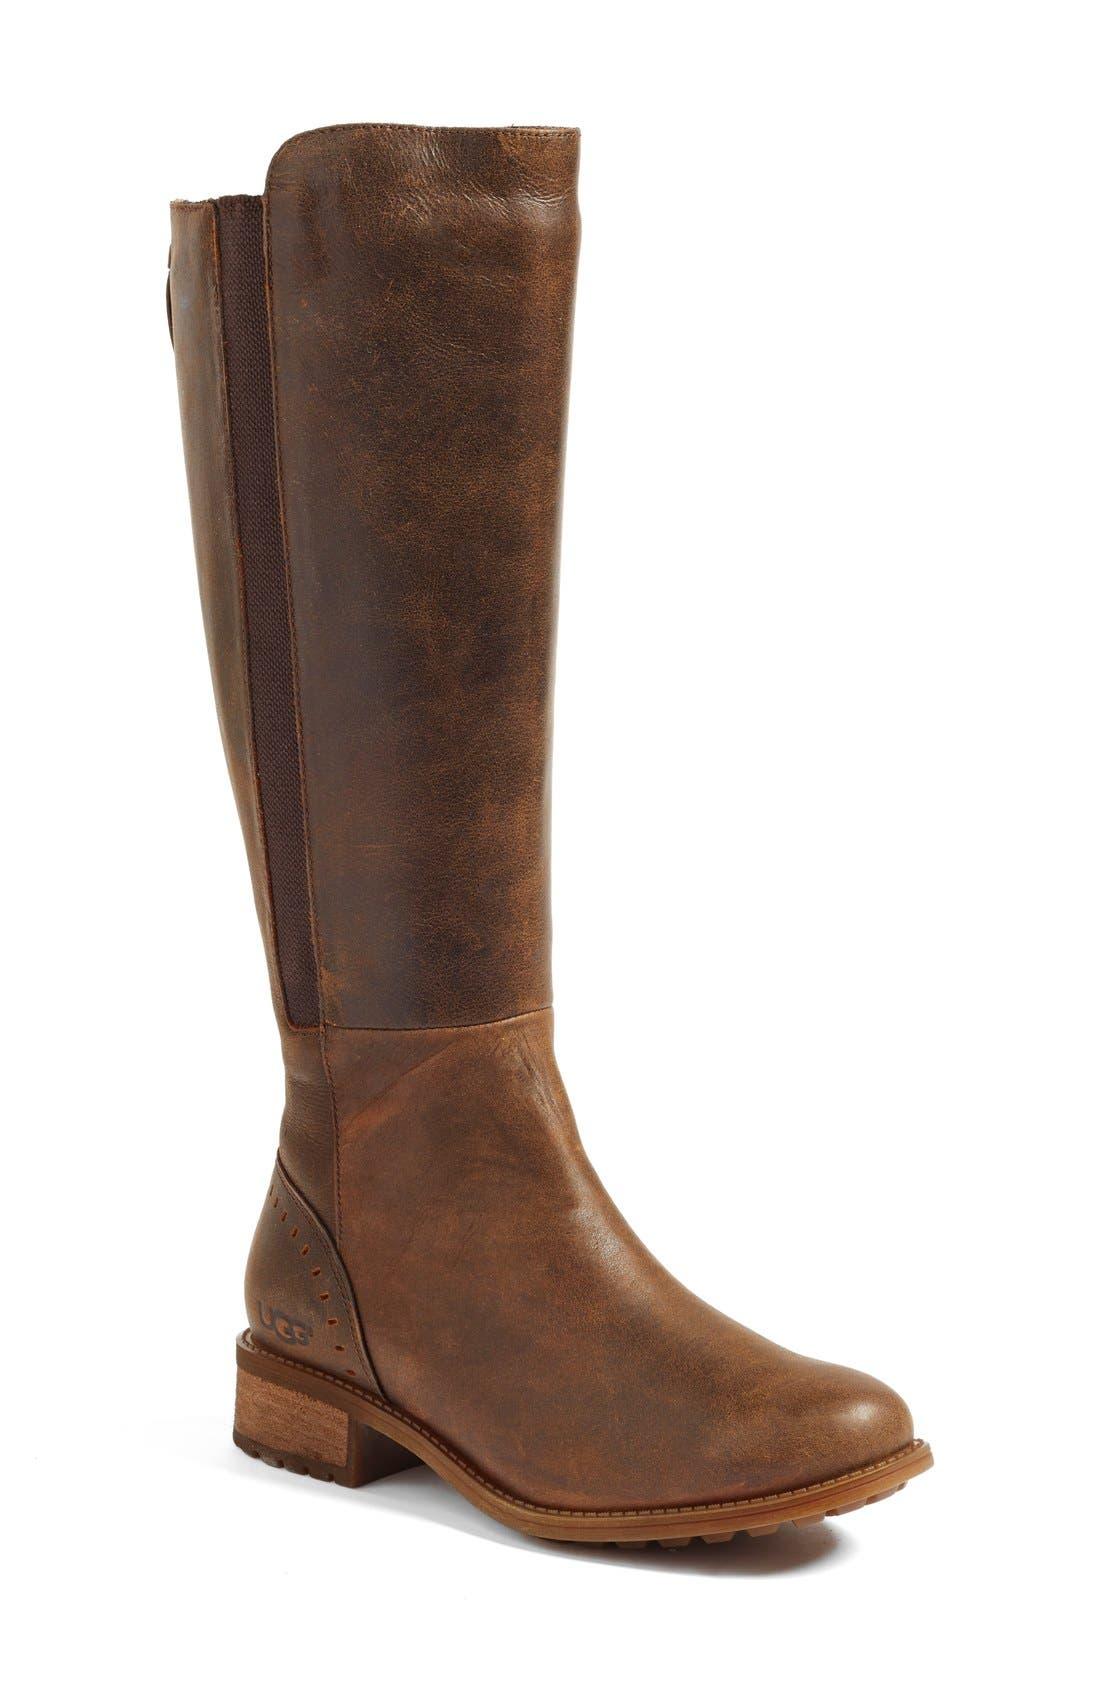 Alternate Image 1 Selected - UGG® 'Vinson' Boot (Women)